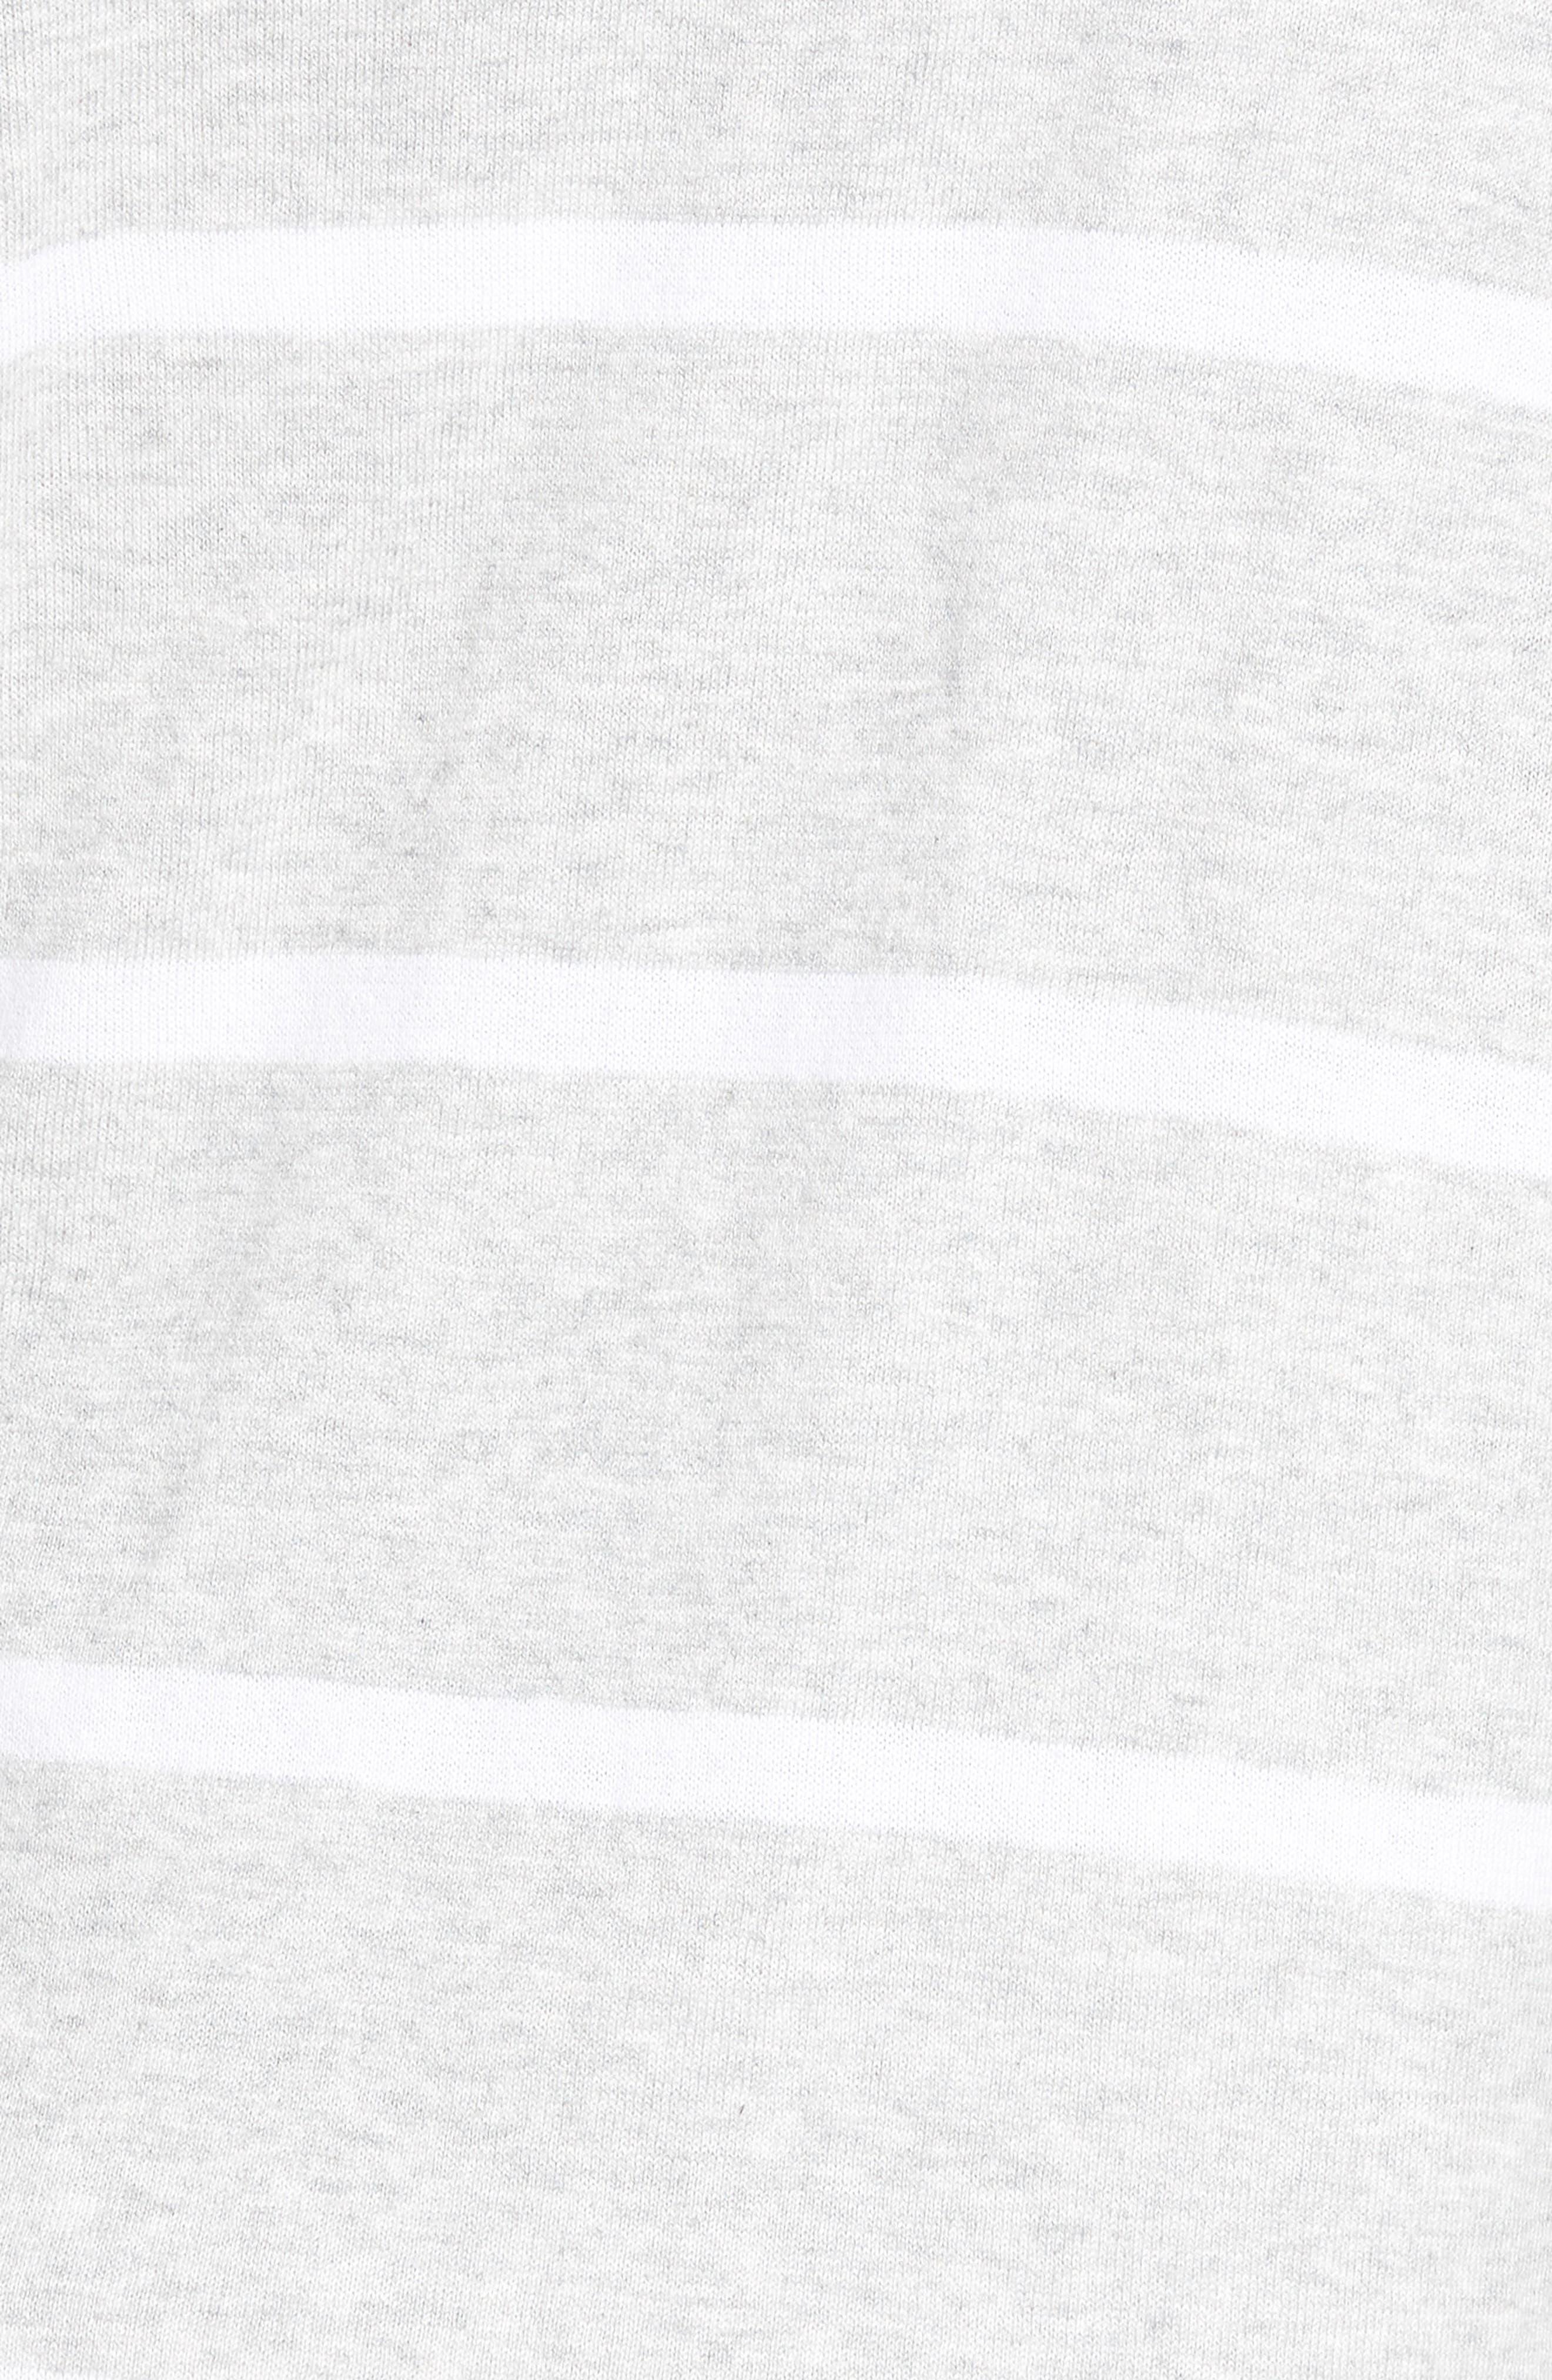 Flyaway Stripe Hoodie Cardigan,                             Alternate thumbnail 6, color,                             Pebble Grey Mex/ Warm White